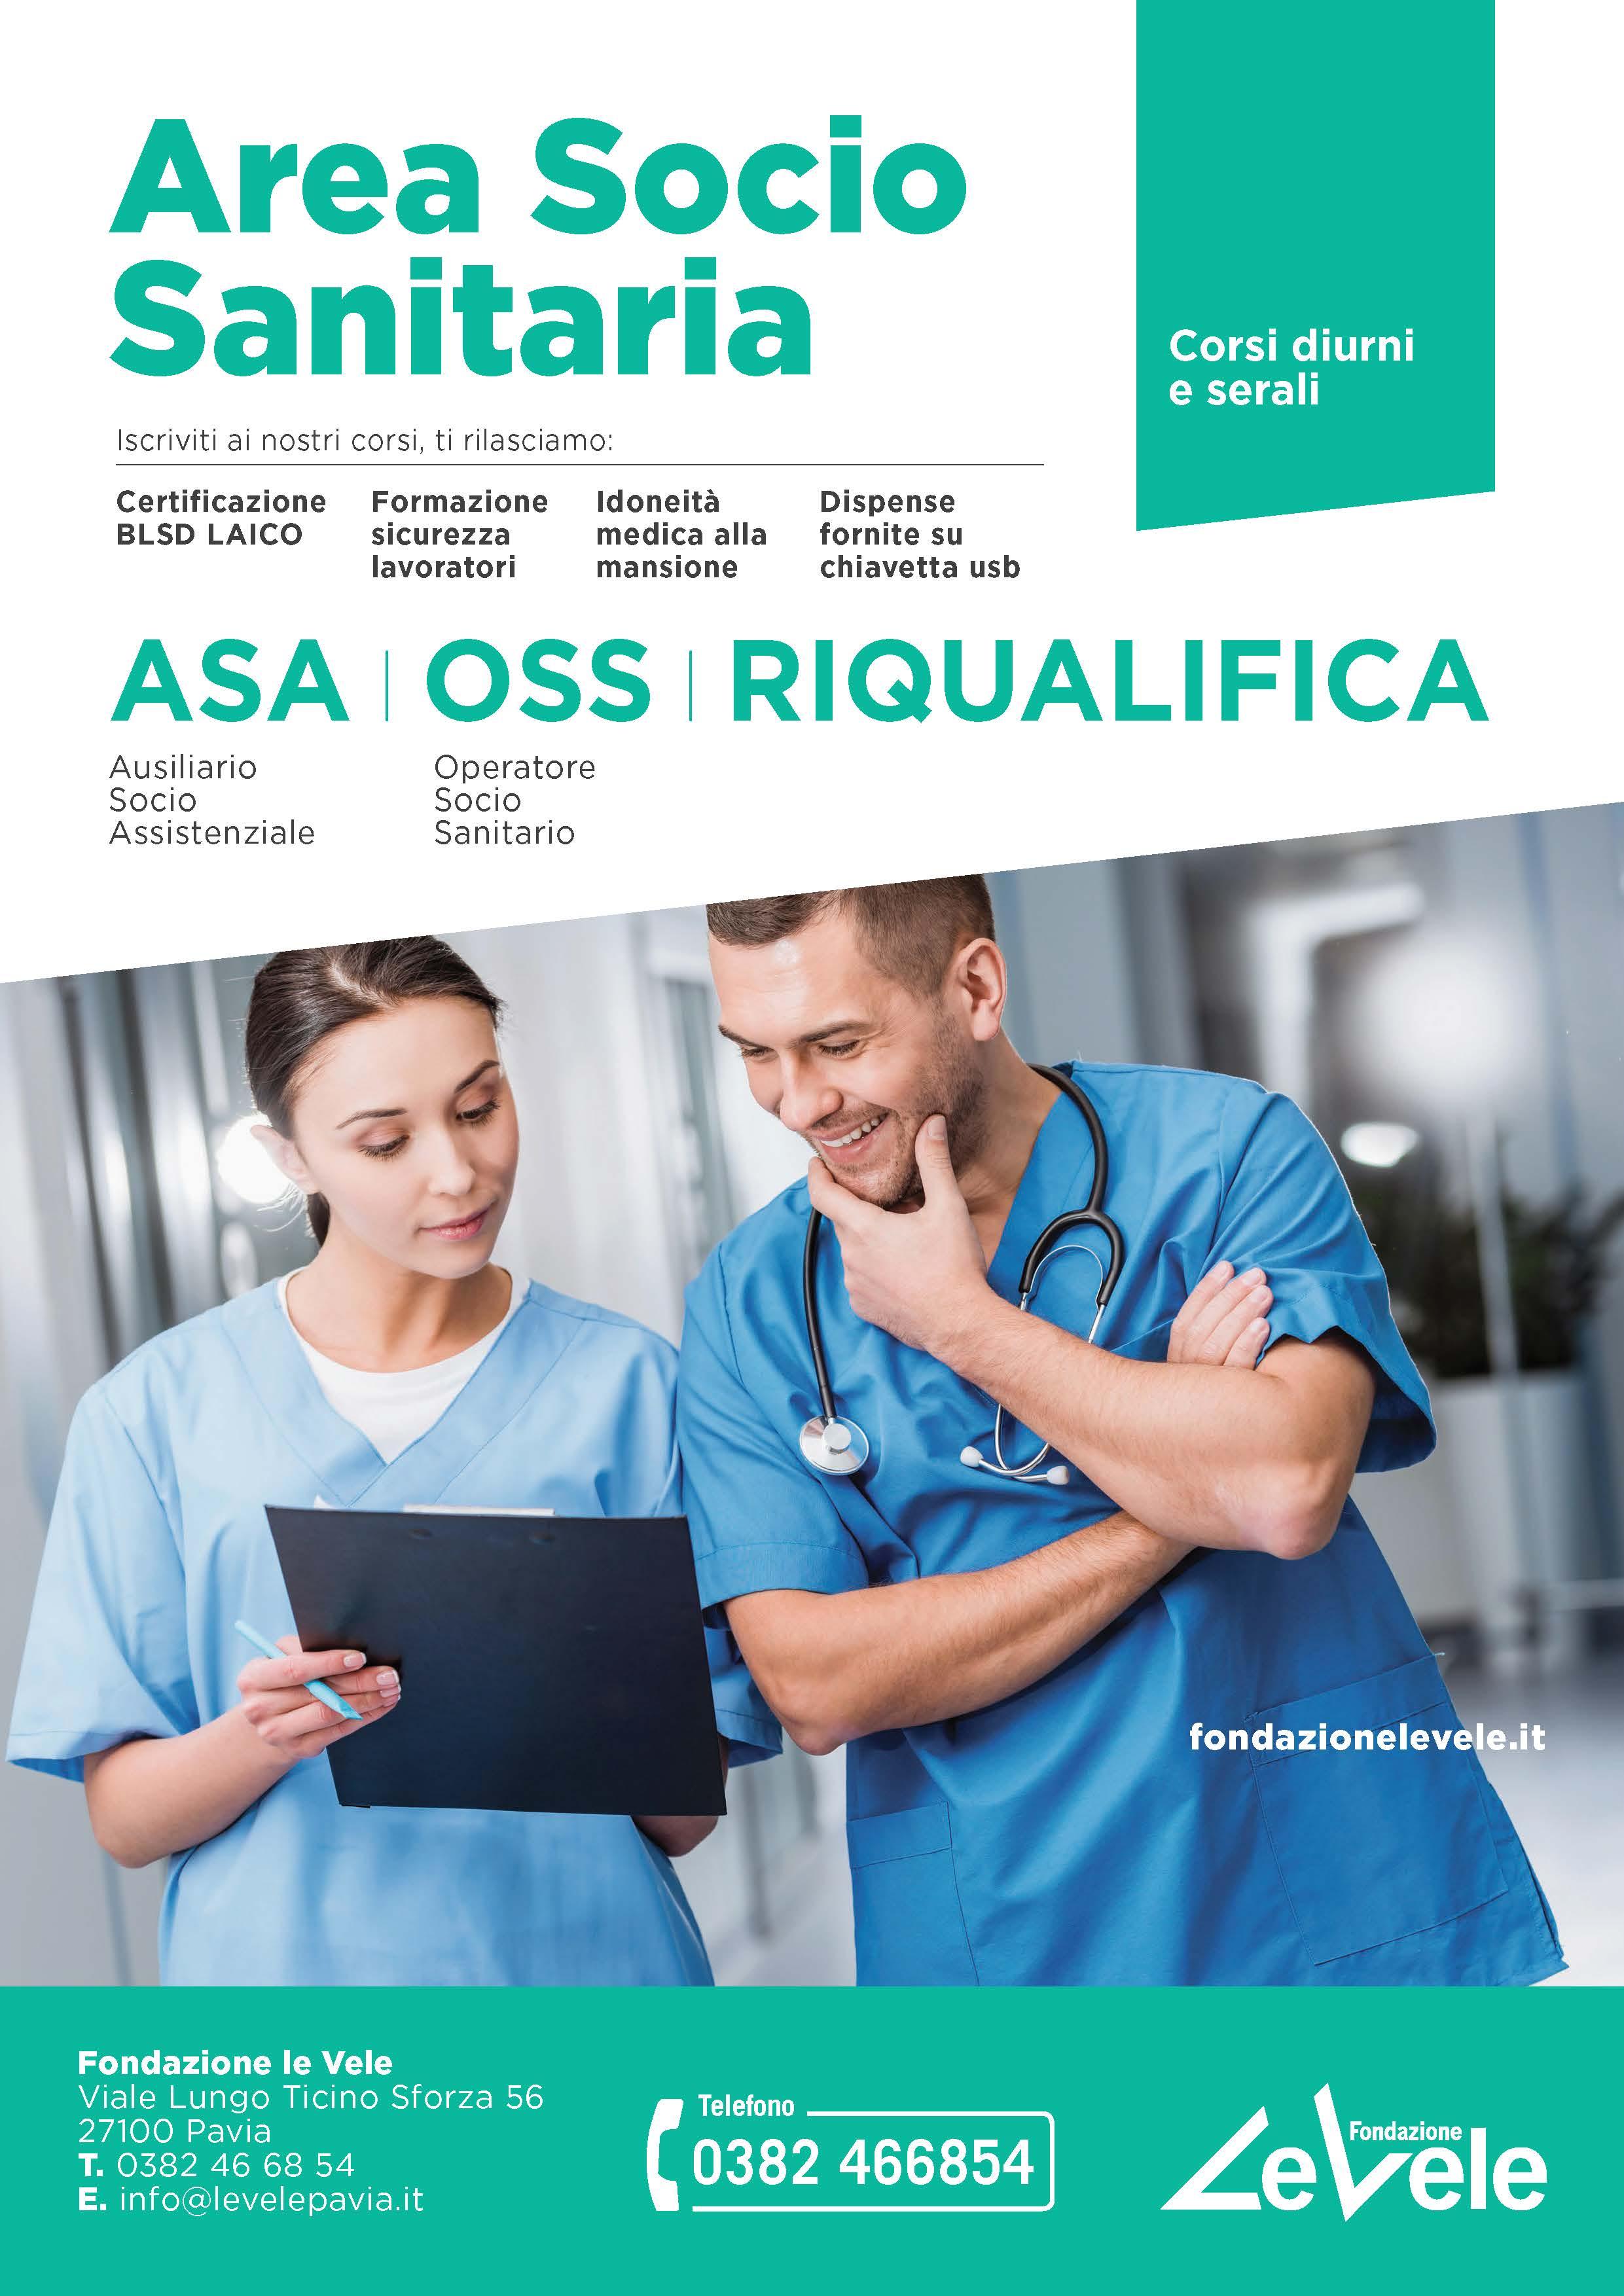 AVVIO CORSI ASA – OSS – RIQUALIFICA ASA/OSS ONLINE